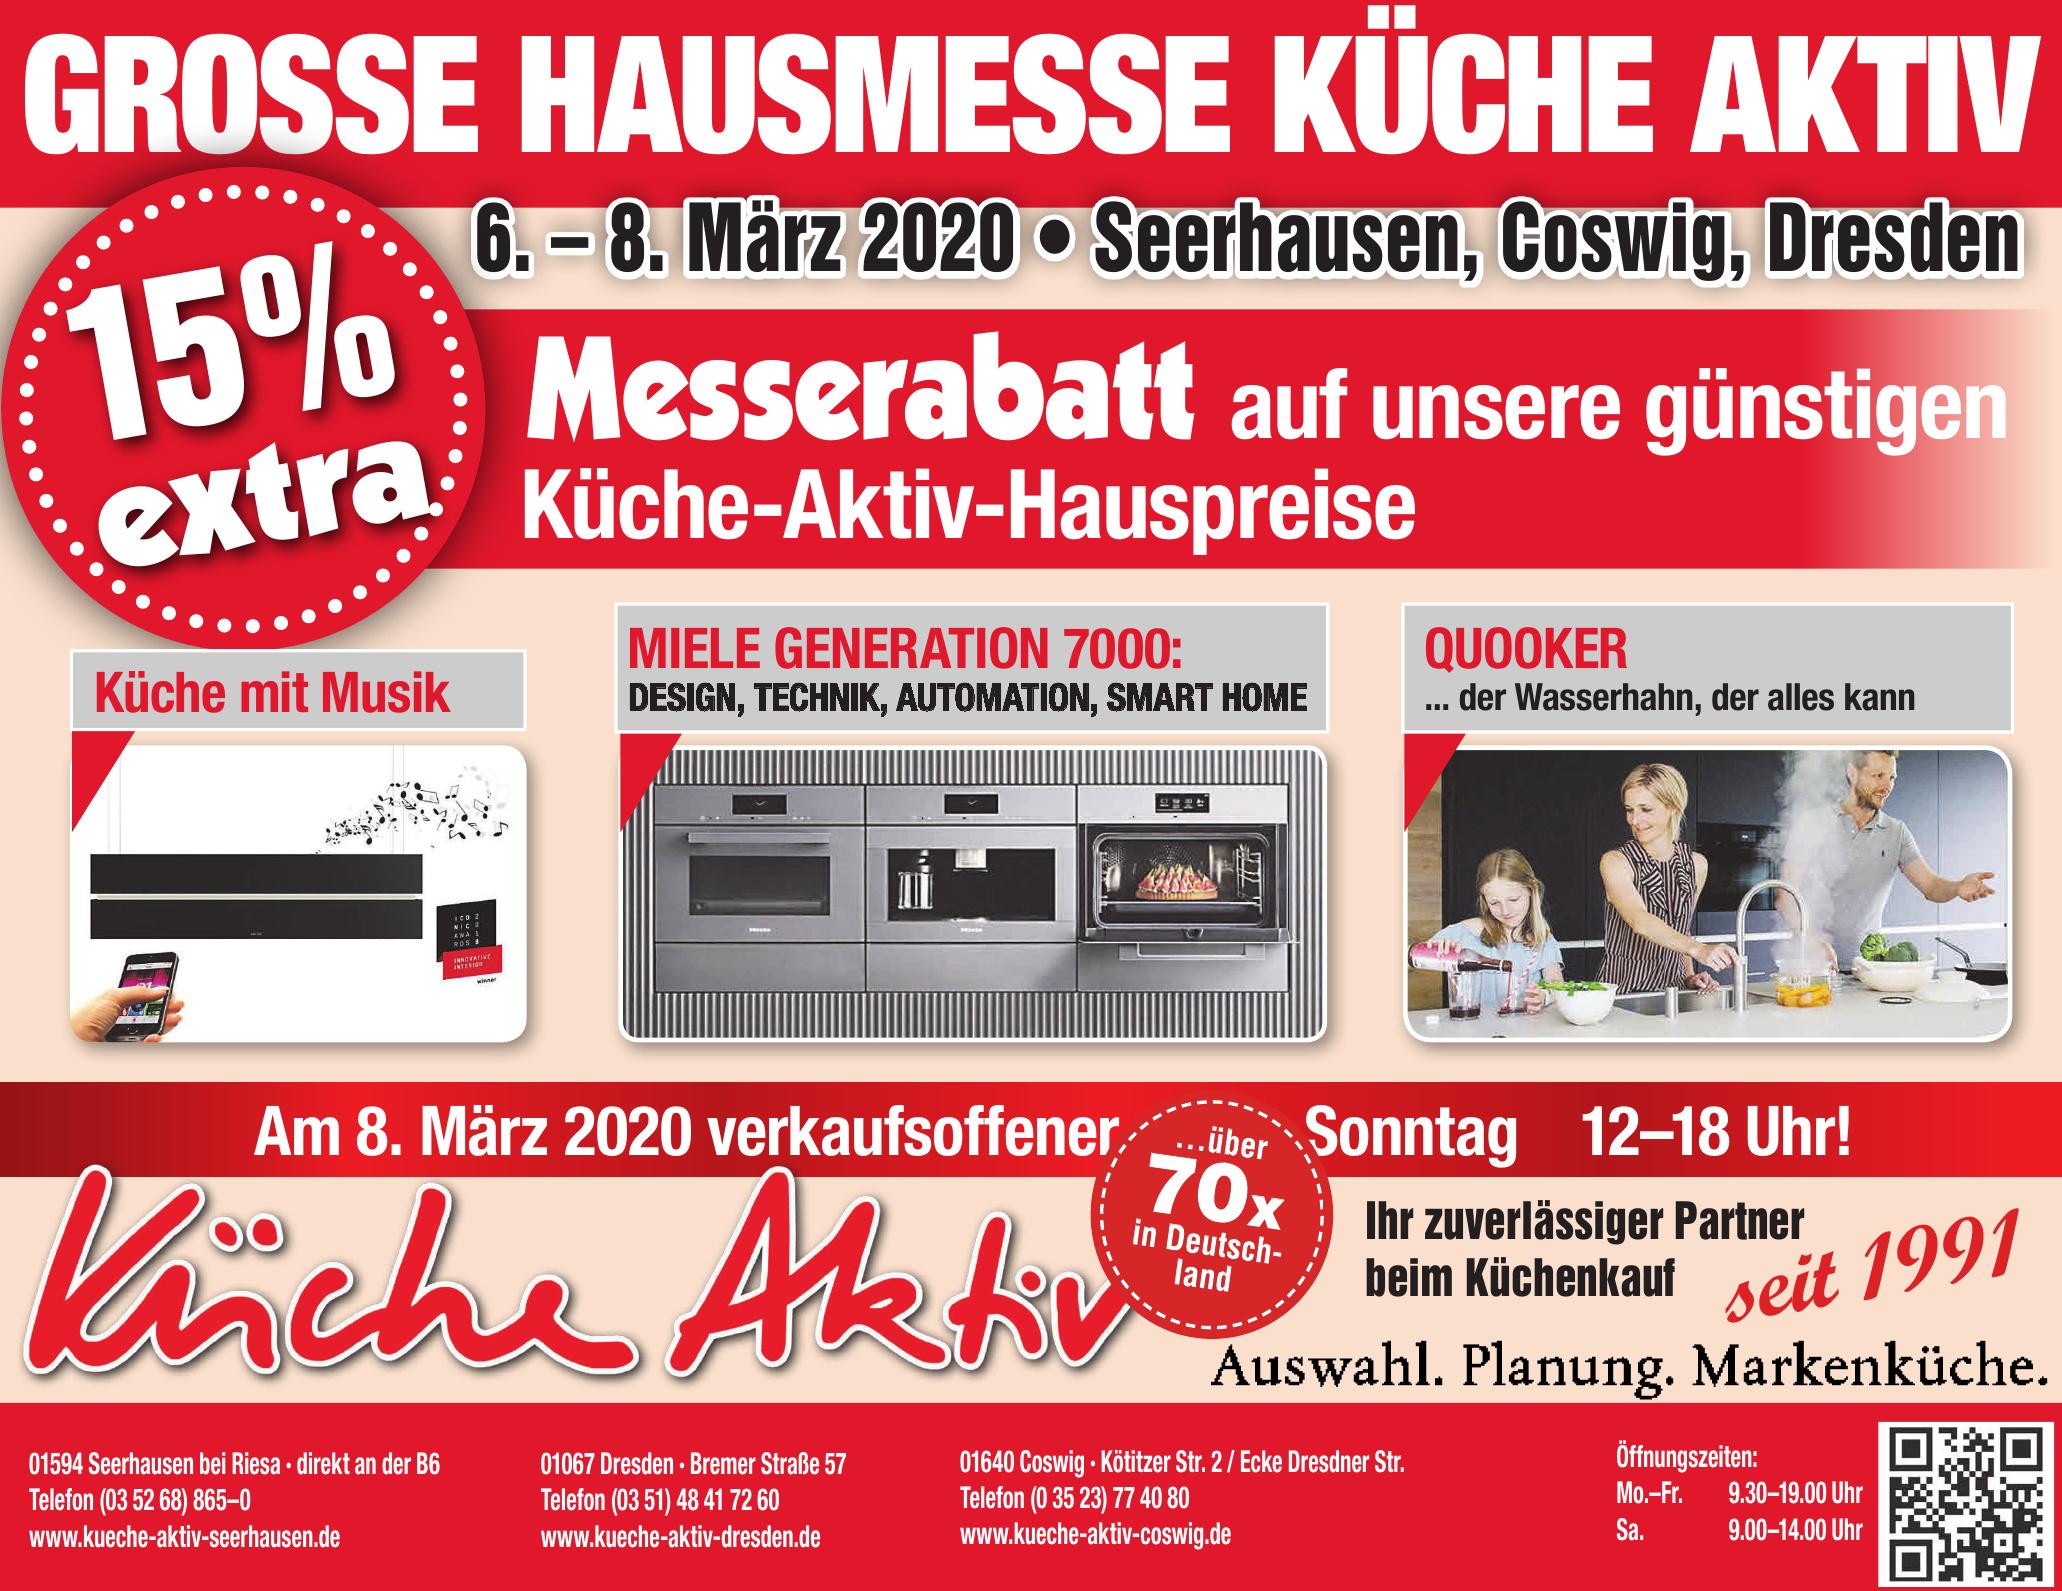 Vetter's Küche Aktiv GmbH